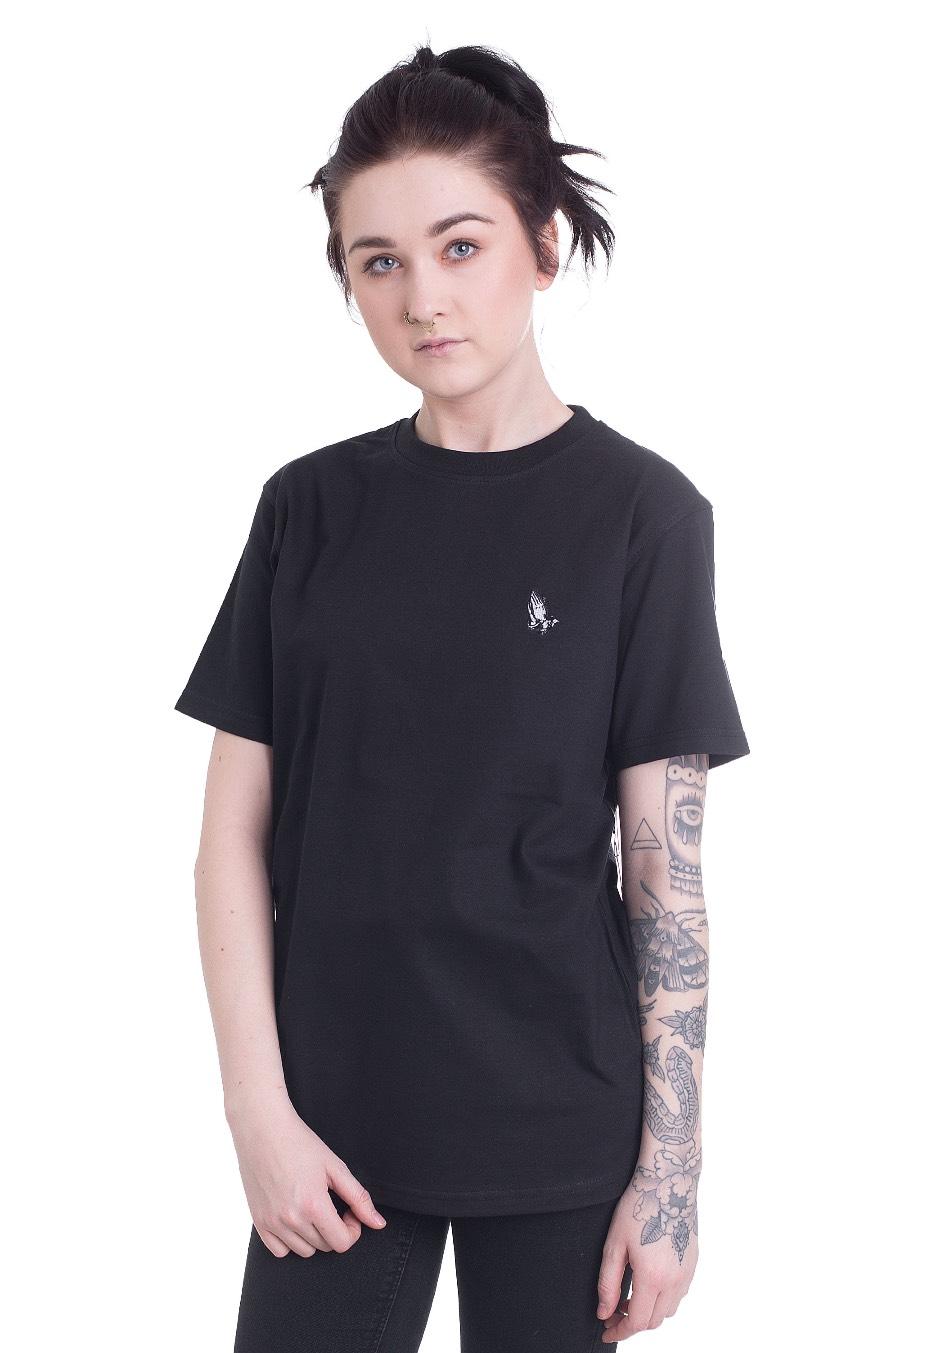 a3d677277 Santa Cruz - Ghost Lady Black - T-Shirt - Streetwear Shop - Impericon.com US